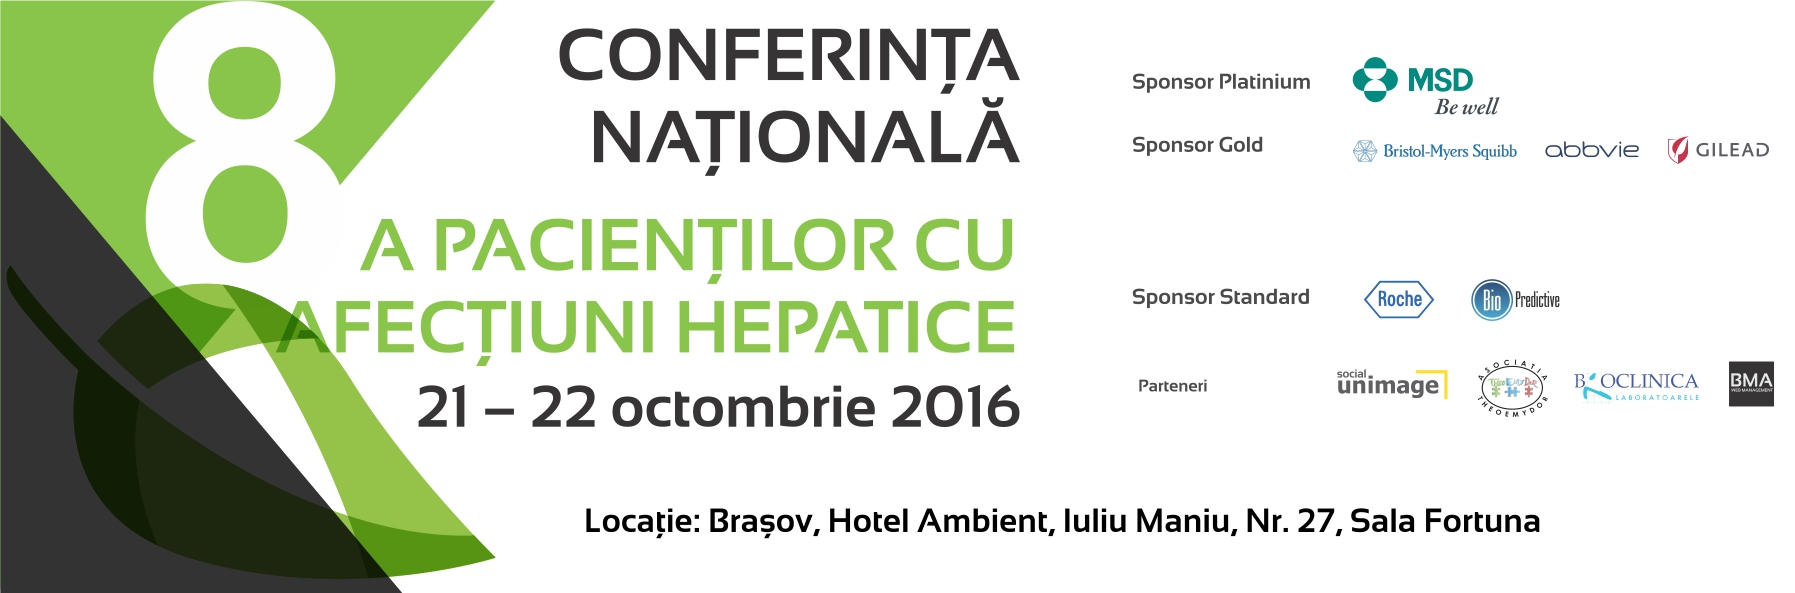 conferinta nationala apah 2016